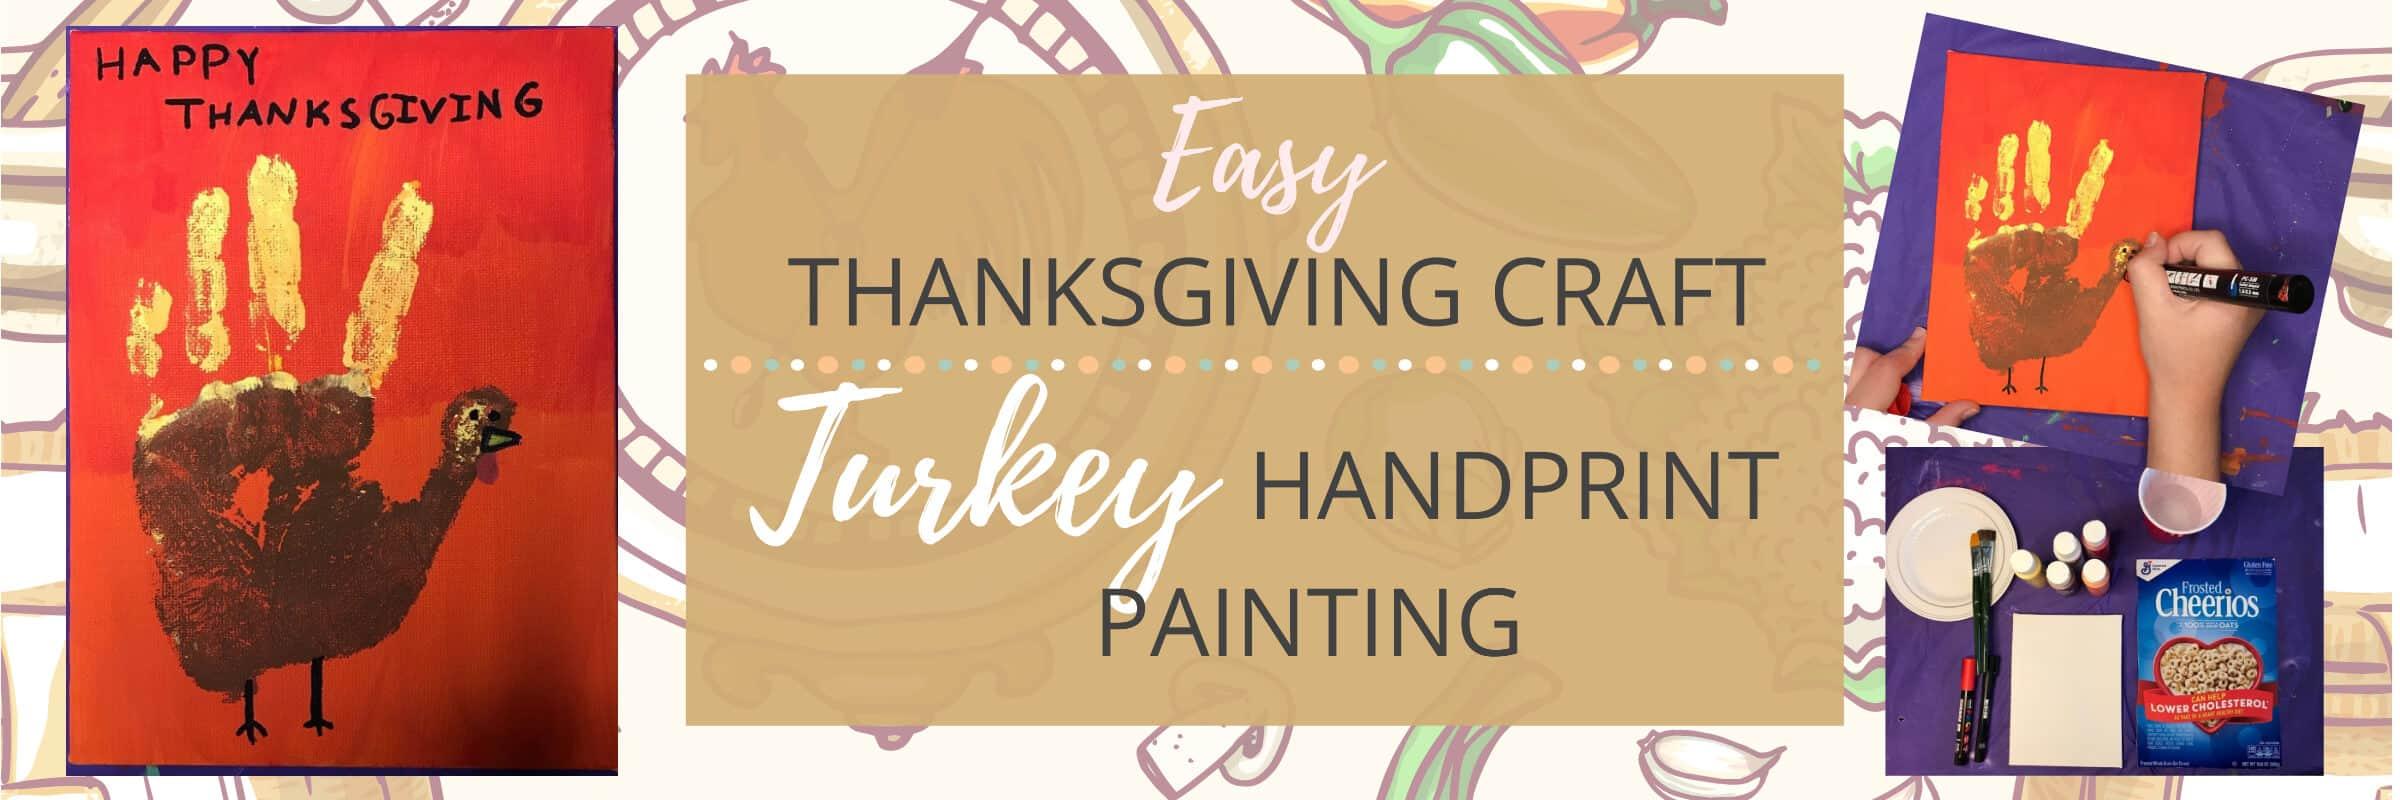 Easy Thanksgiving Craft Turkey Handprint Painting Graphich with Pic of Turkey Handprint Painting and supplies